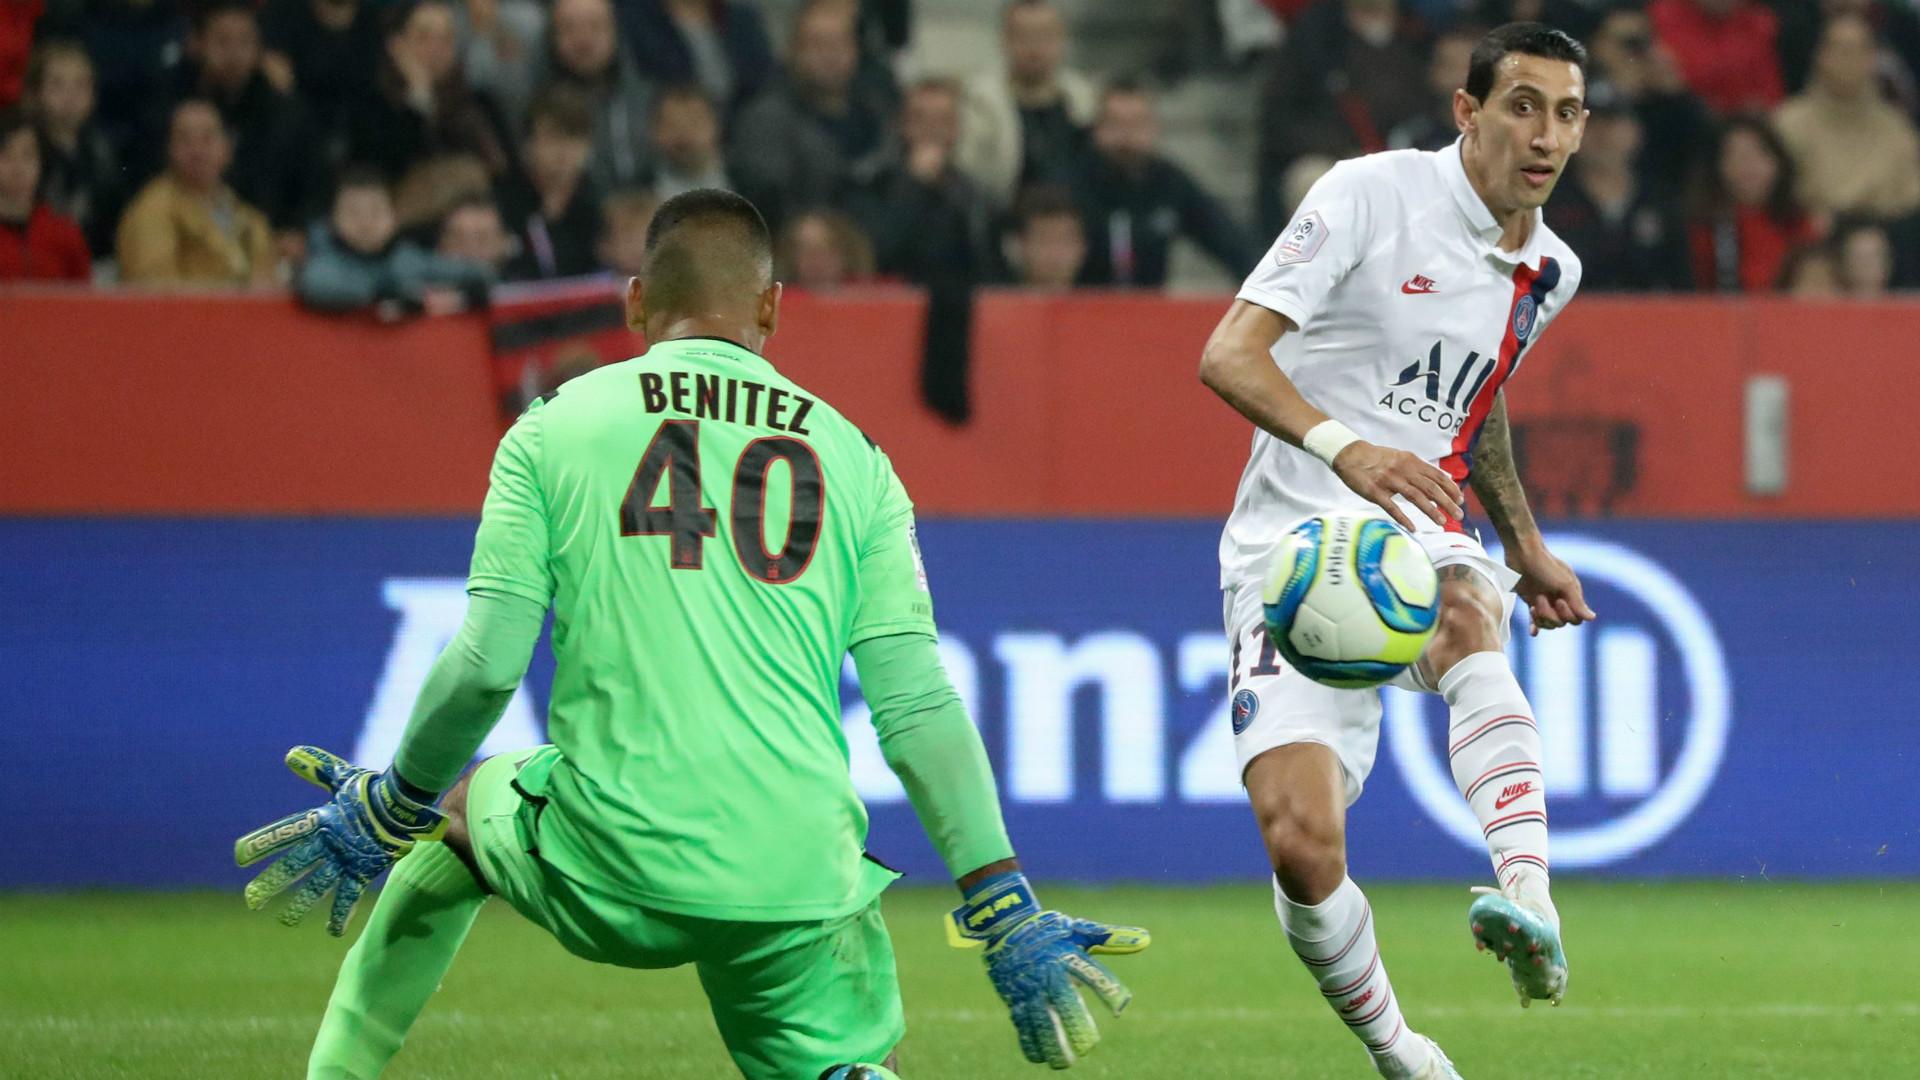 Nice-PSG (1-4) - Porté par un Di Maria en feu, le PSG enchaîne